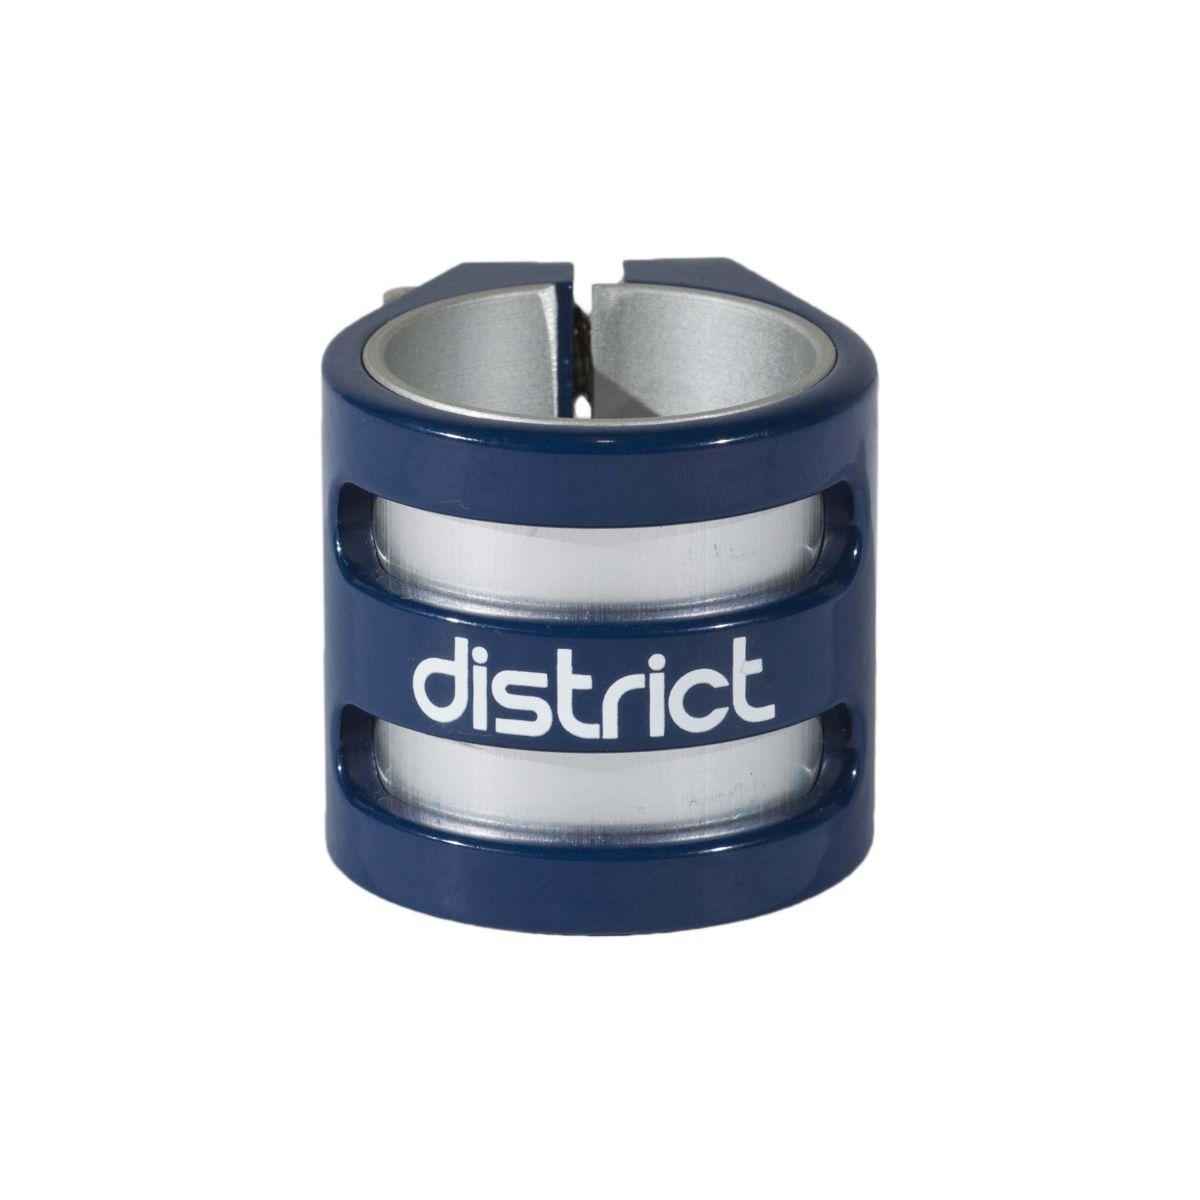 Zacisk District S-series DLC15 Marino